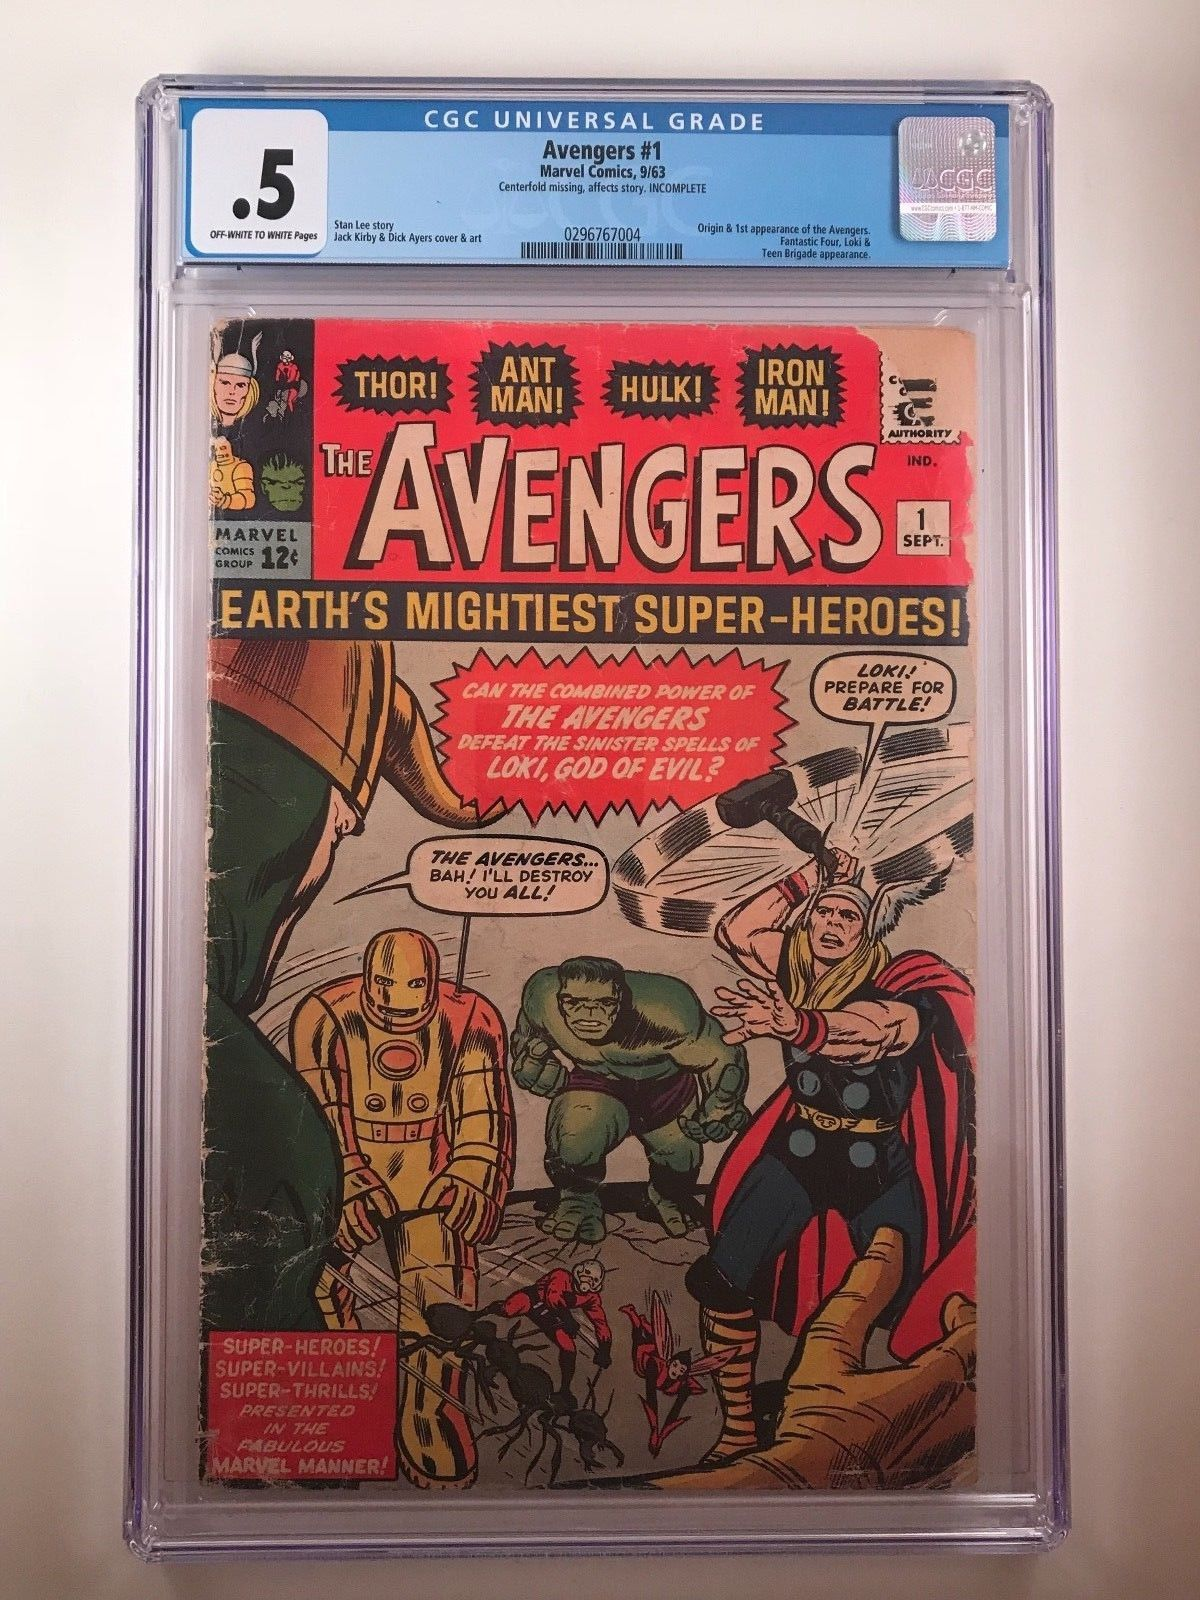 Avengers #1 (Marvel 1963) KEY ISSUE 1st appearance of the Avengers CGC 0.5